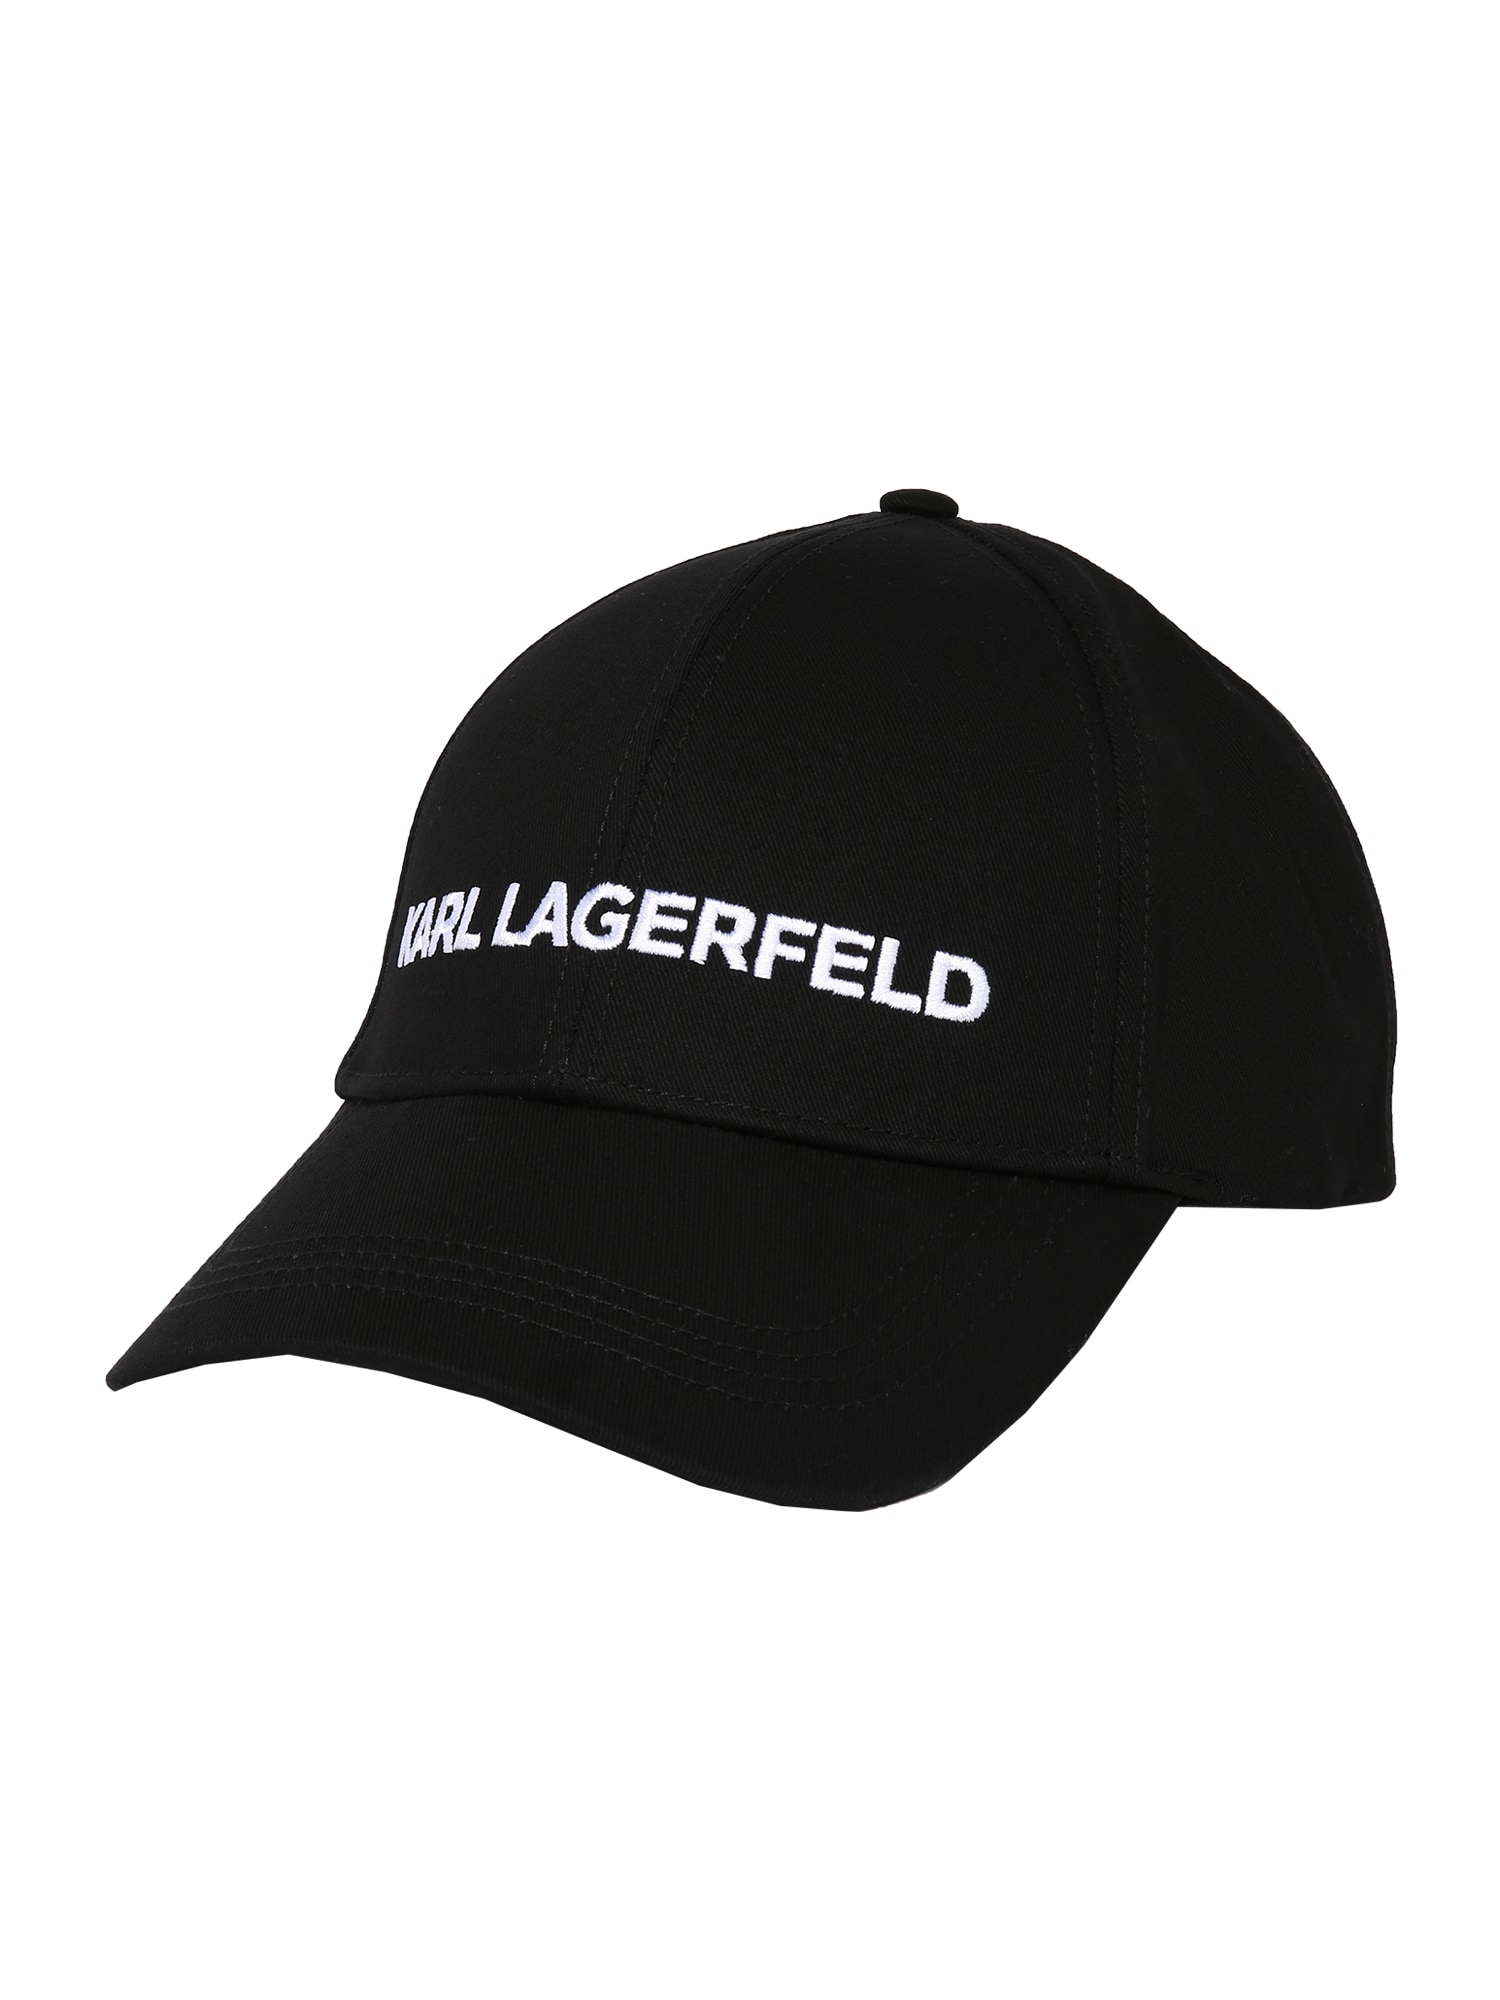 Karl Lagerfeld Kepurė juoda / balta